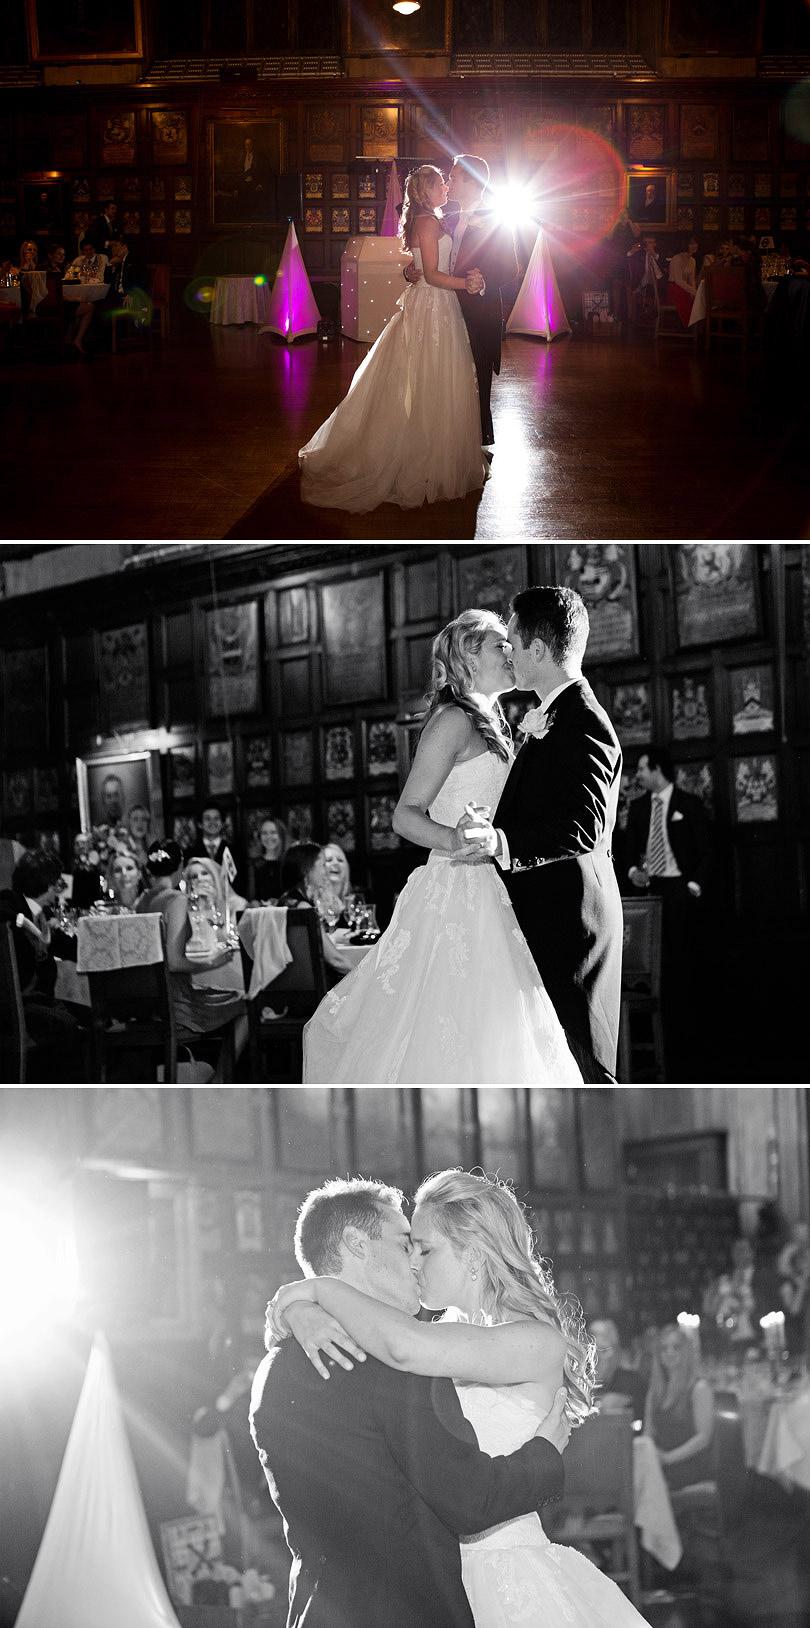 Brompton-Oratory-Lincolns-Inn-Wedding-RachelMax-026.jpg